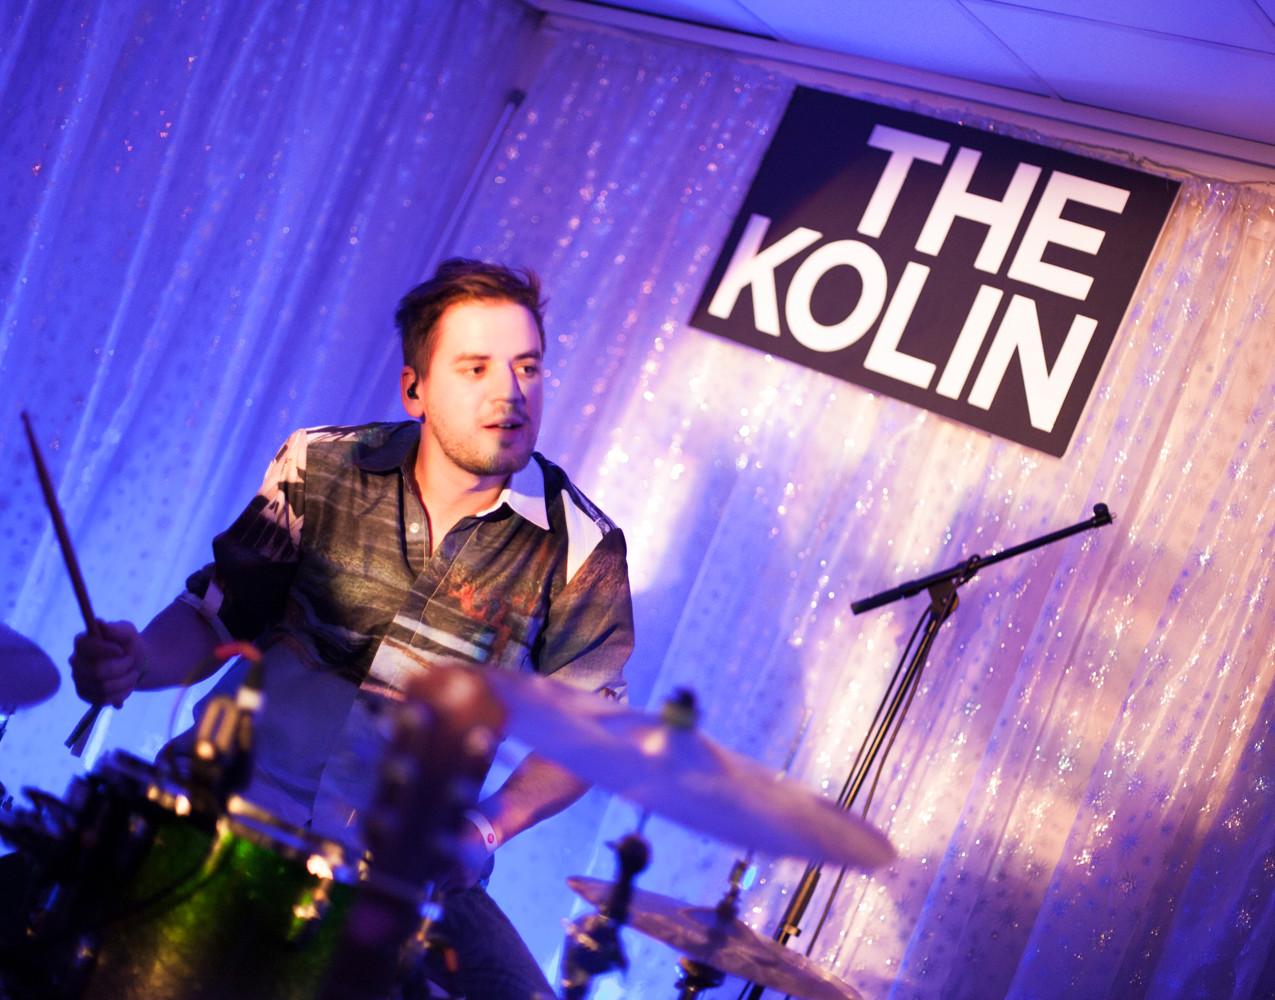 The Kolin, Photo by Gili Dailes_19